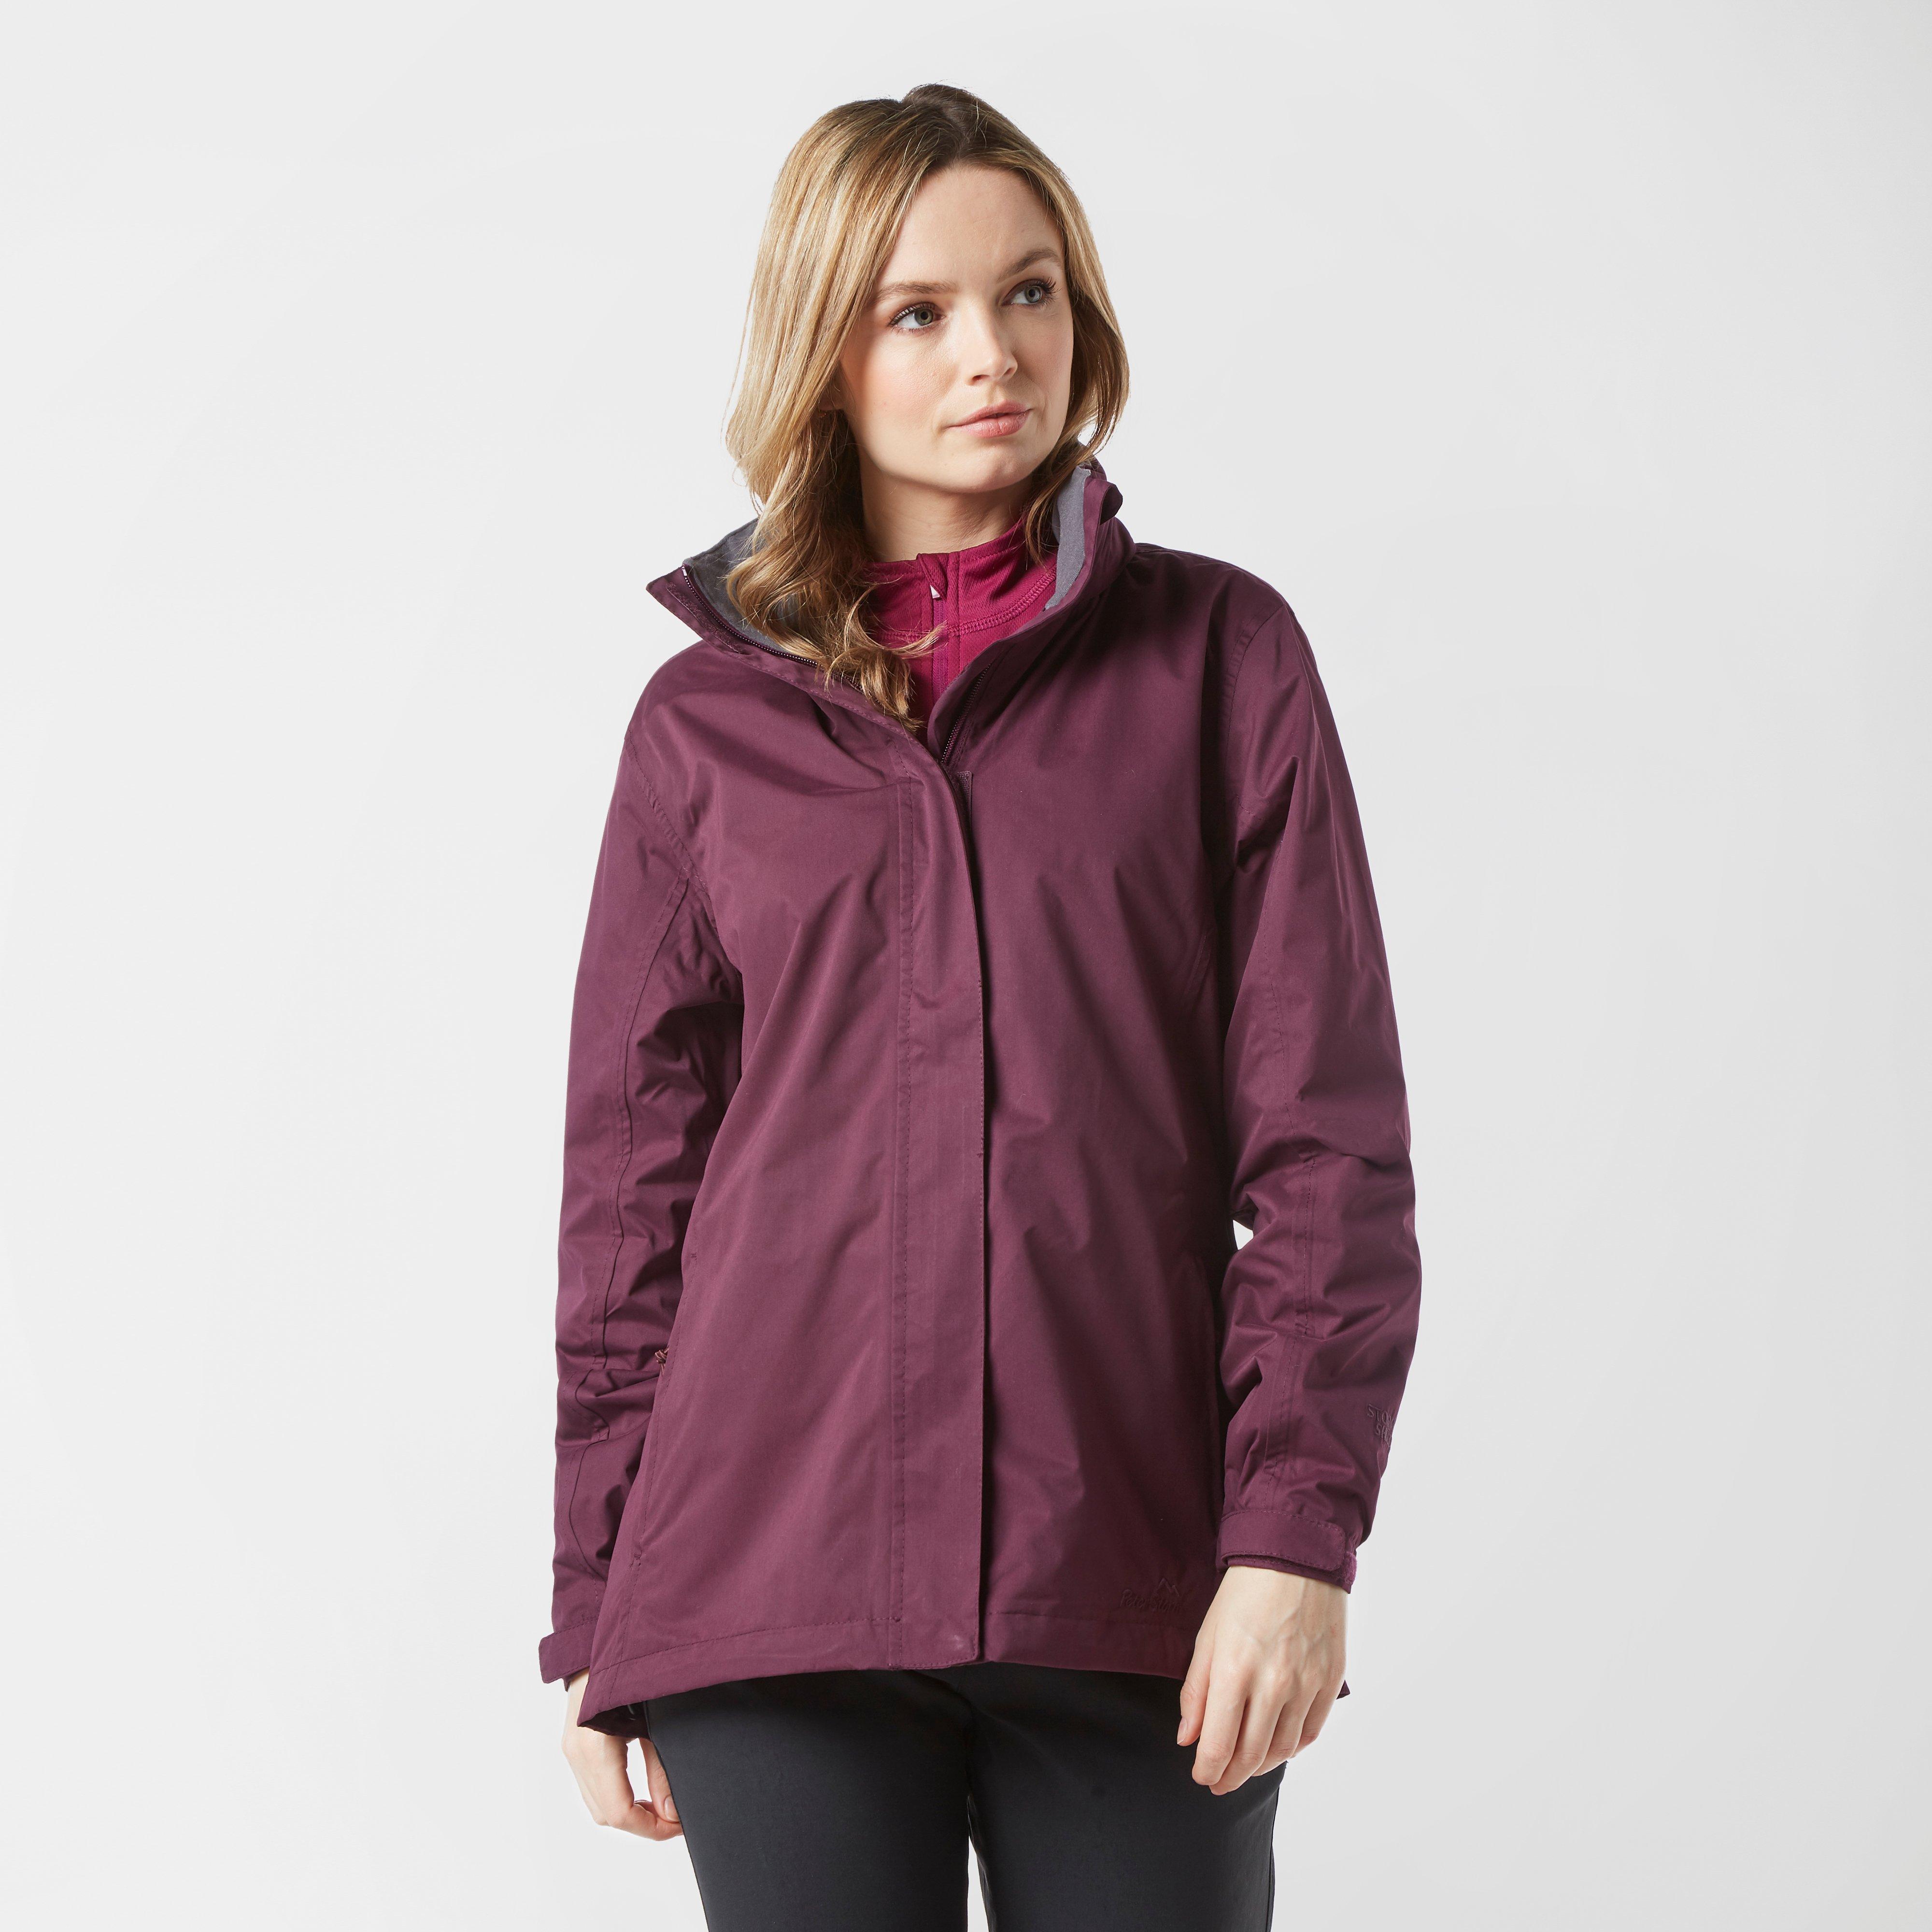 Peter Storm Peter Storm womens Downpour Waterproof Jacket - Purple, Purple